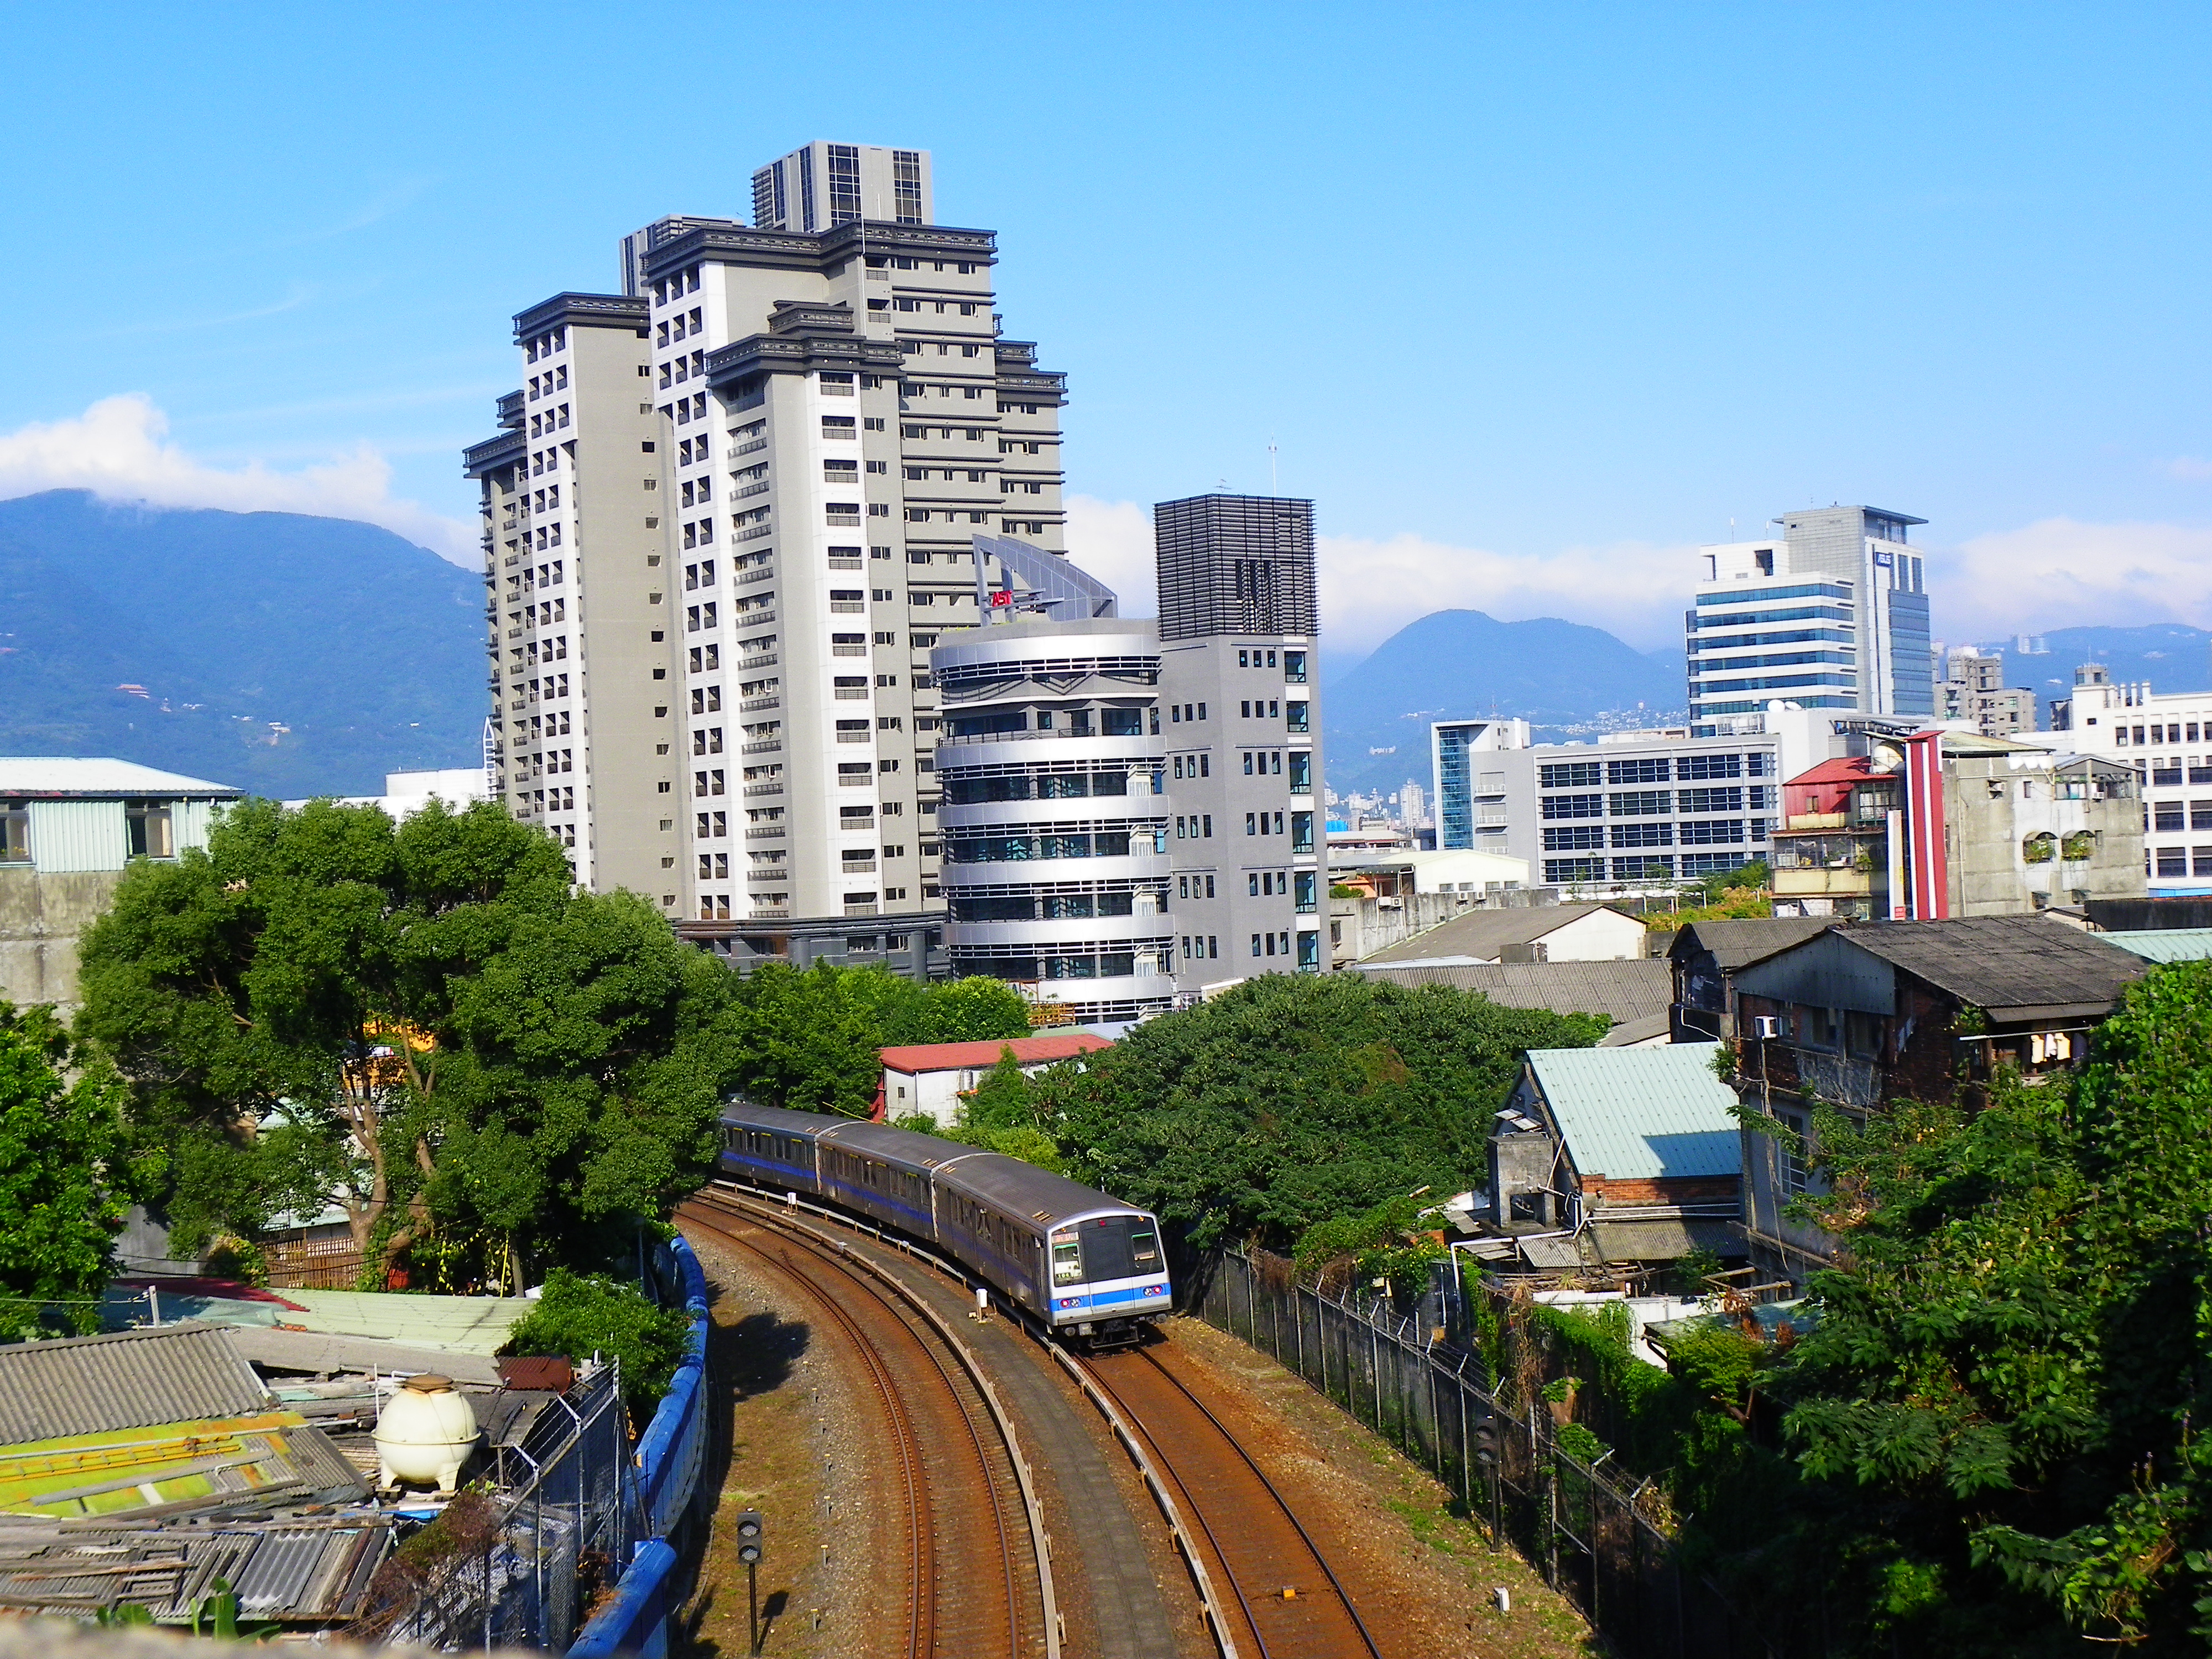 Mrt Train Line